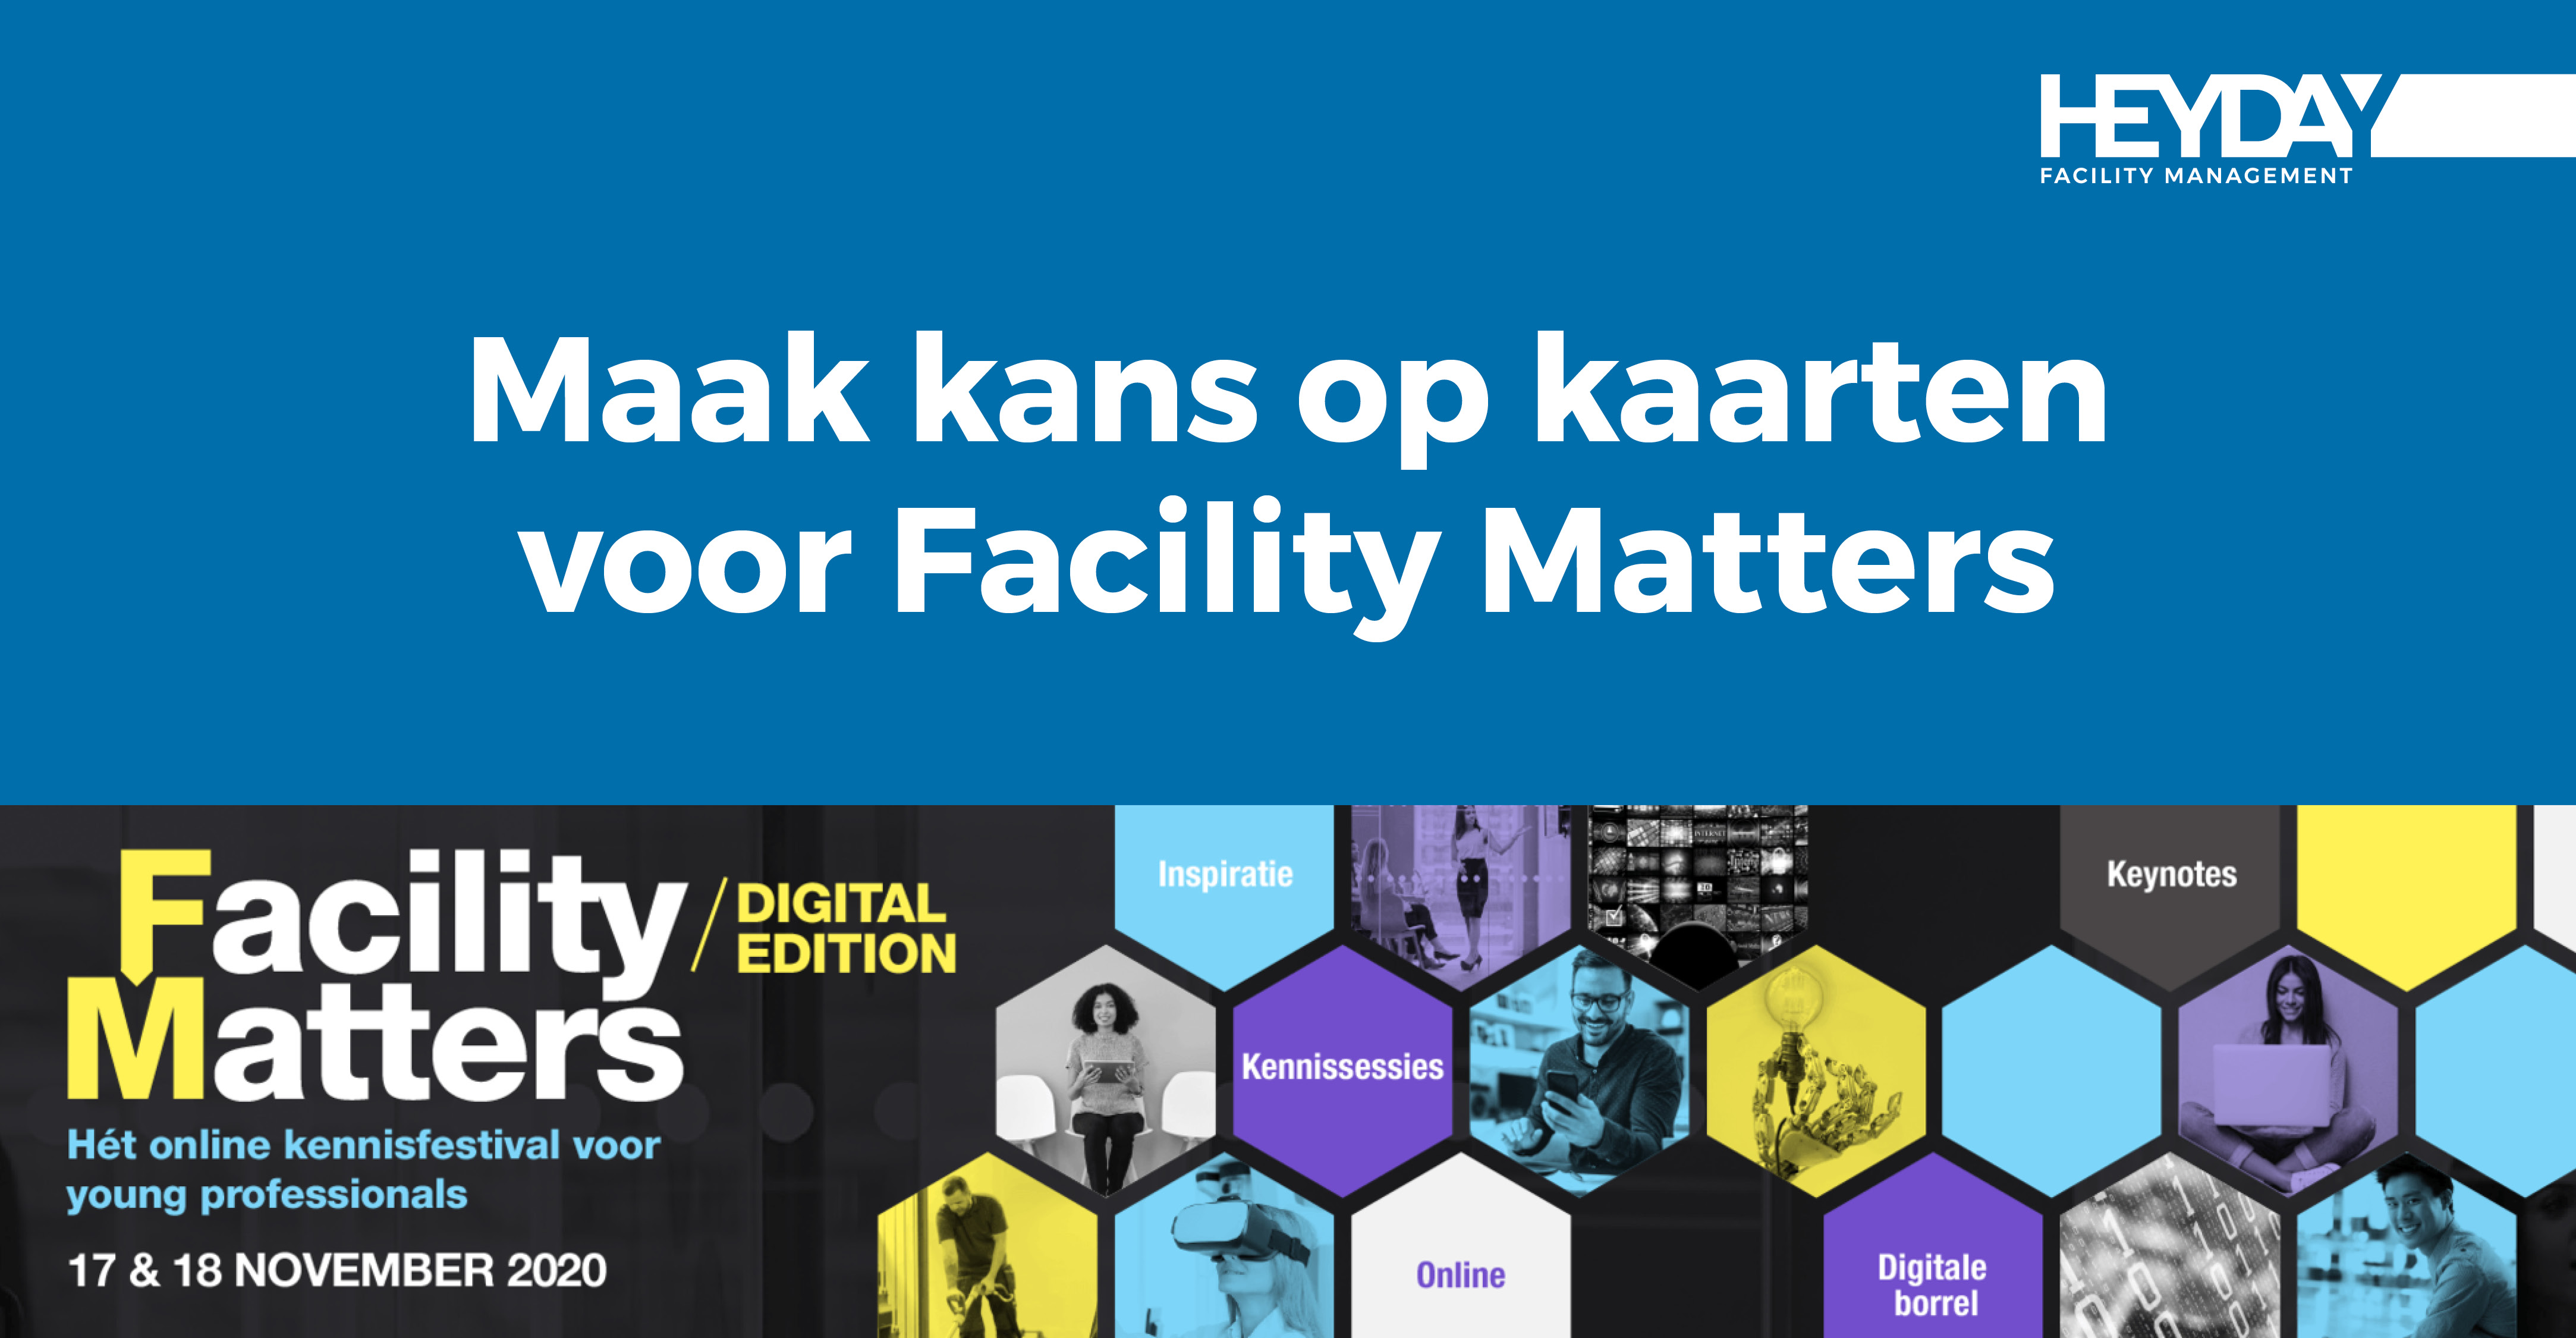 Maak kans op kaarten voor Facility Matters - The Digital Edition op 17-18 november 2020